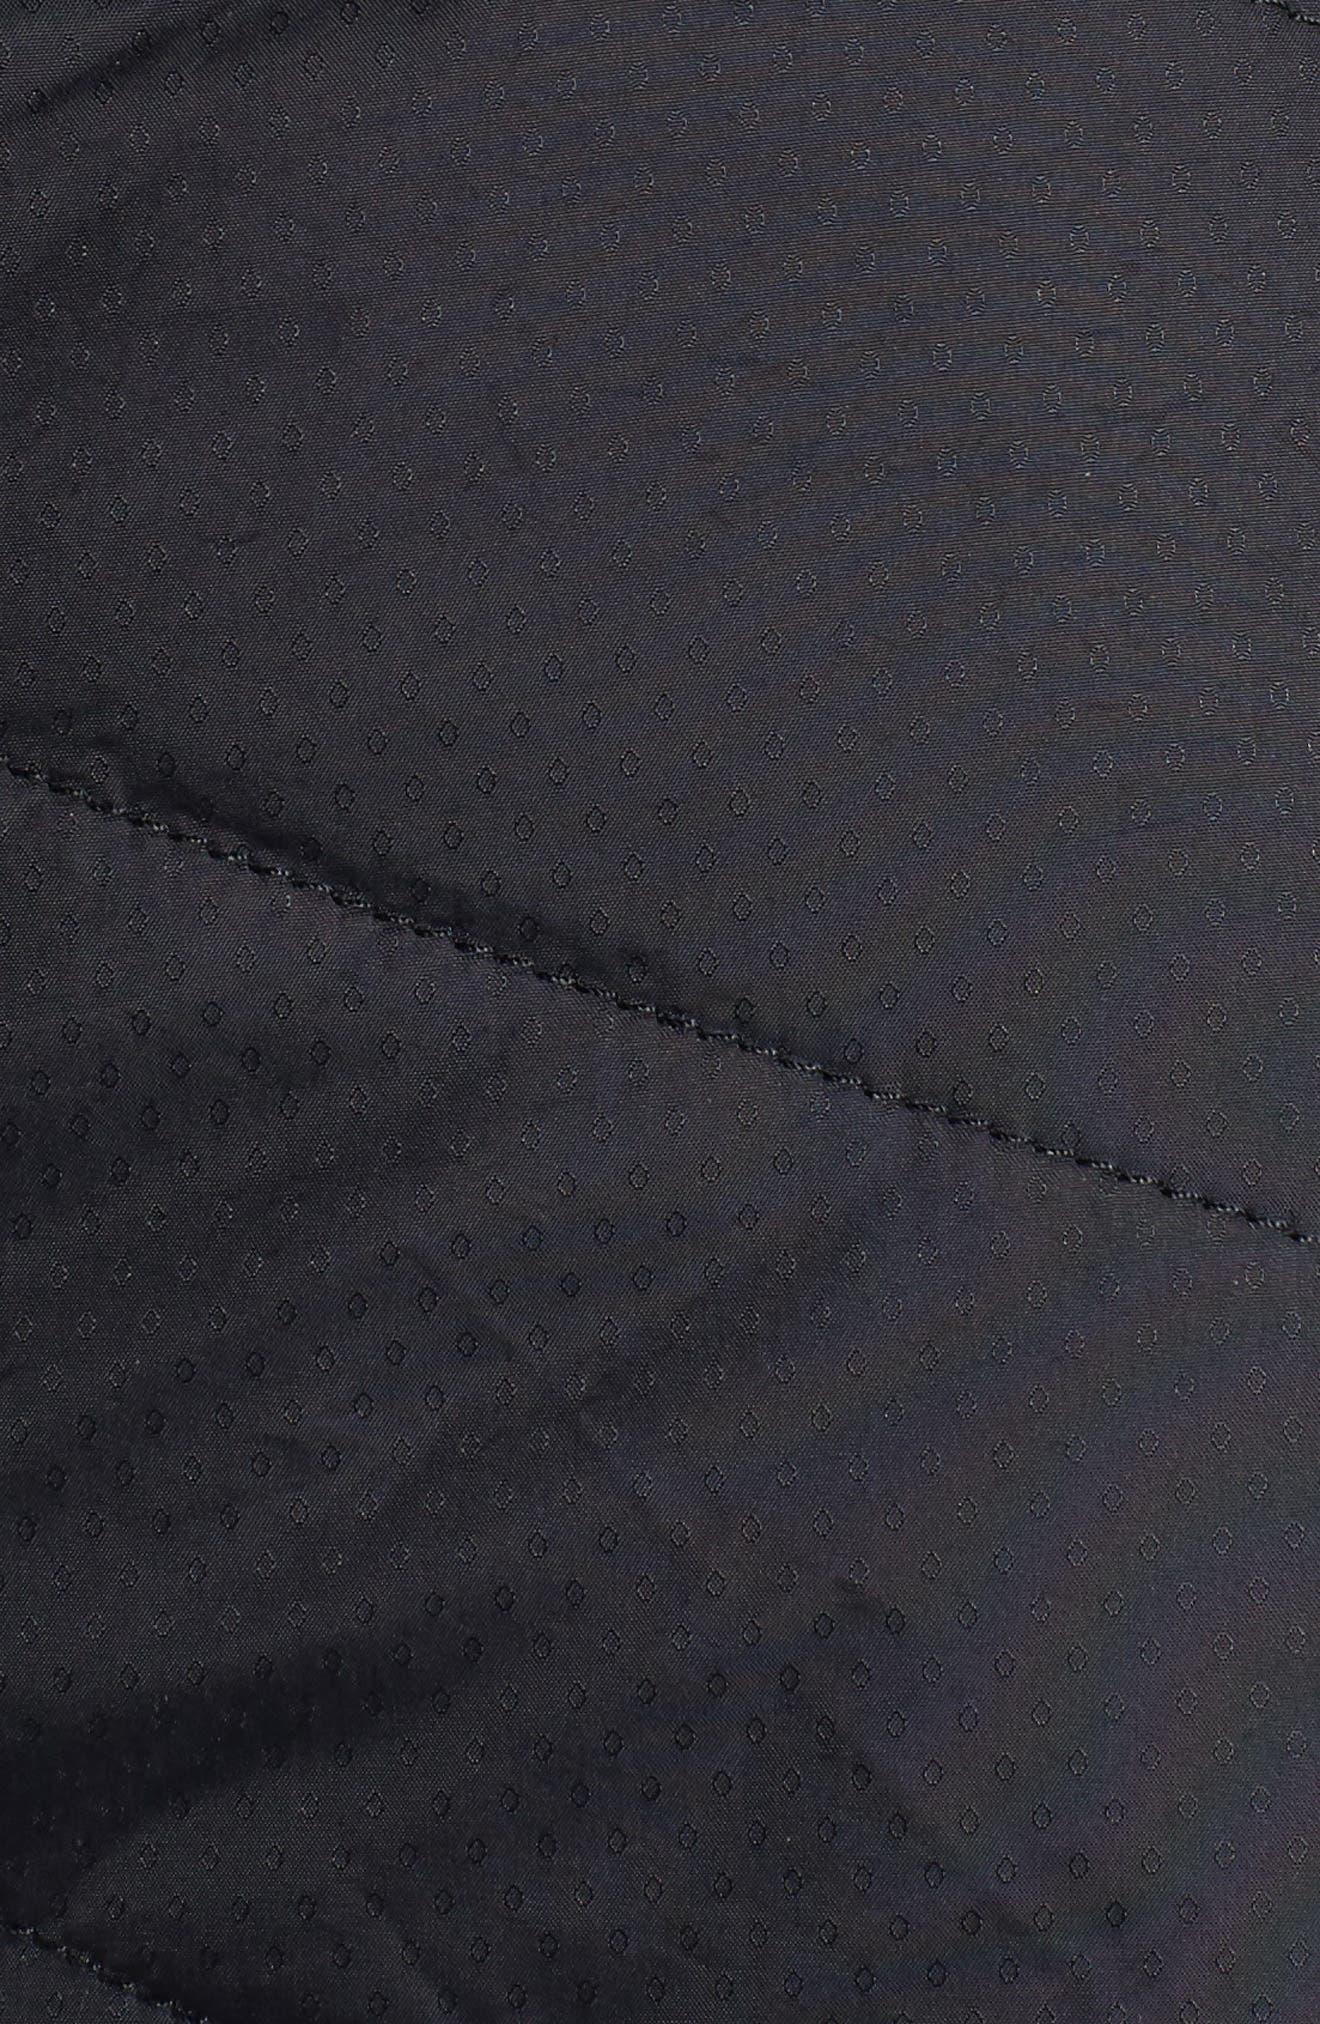 Moonlight Heatseeker Insulated Jacket,                             Alternate thumbnail 7, color,                             001